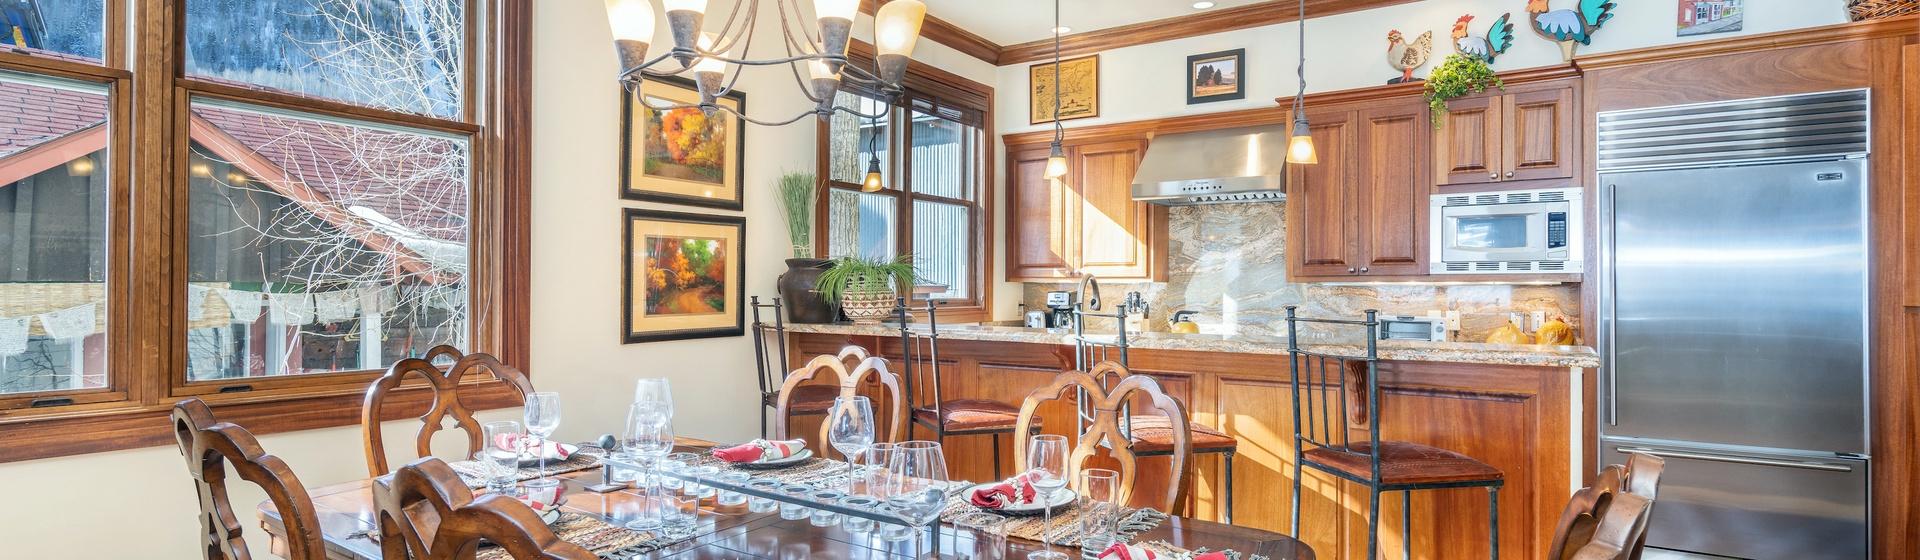 1.03-telluride-tres-casa-A-dining-kitchen-web.jpg